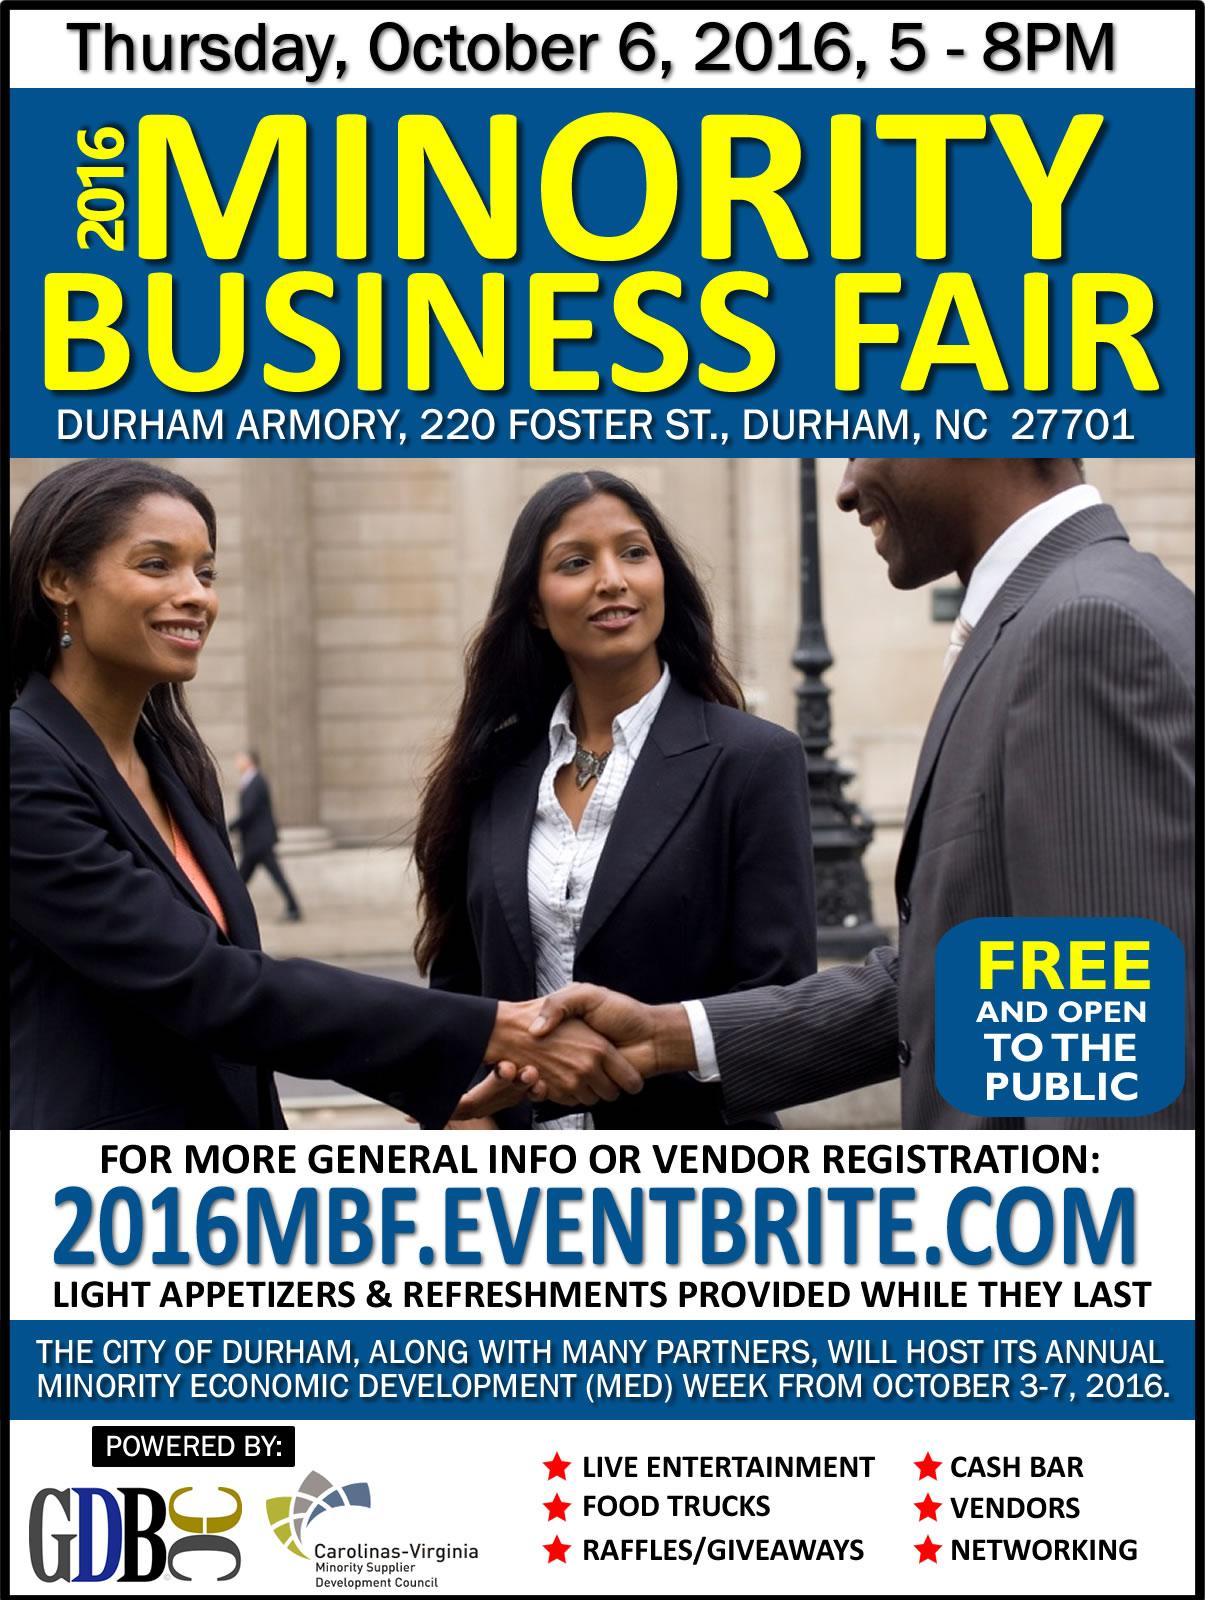 2016 Minority Business Fair | 10/6/2016